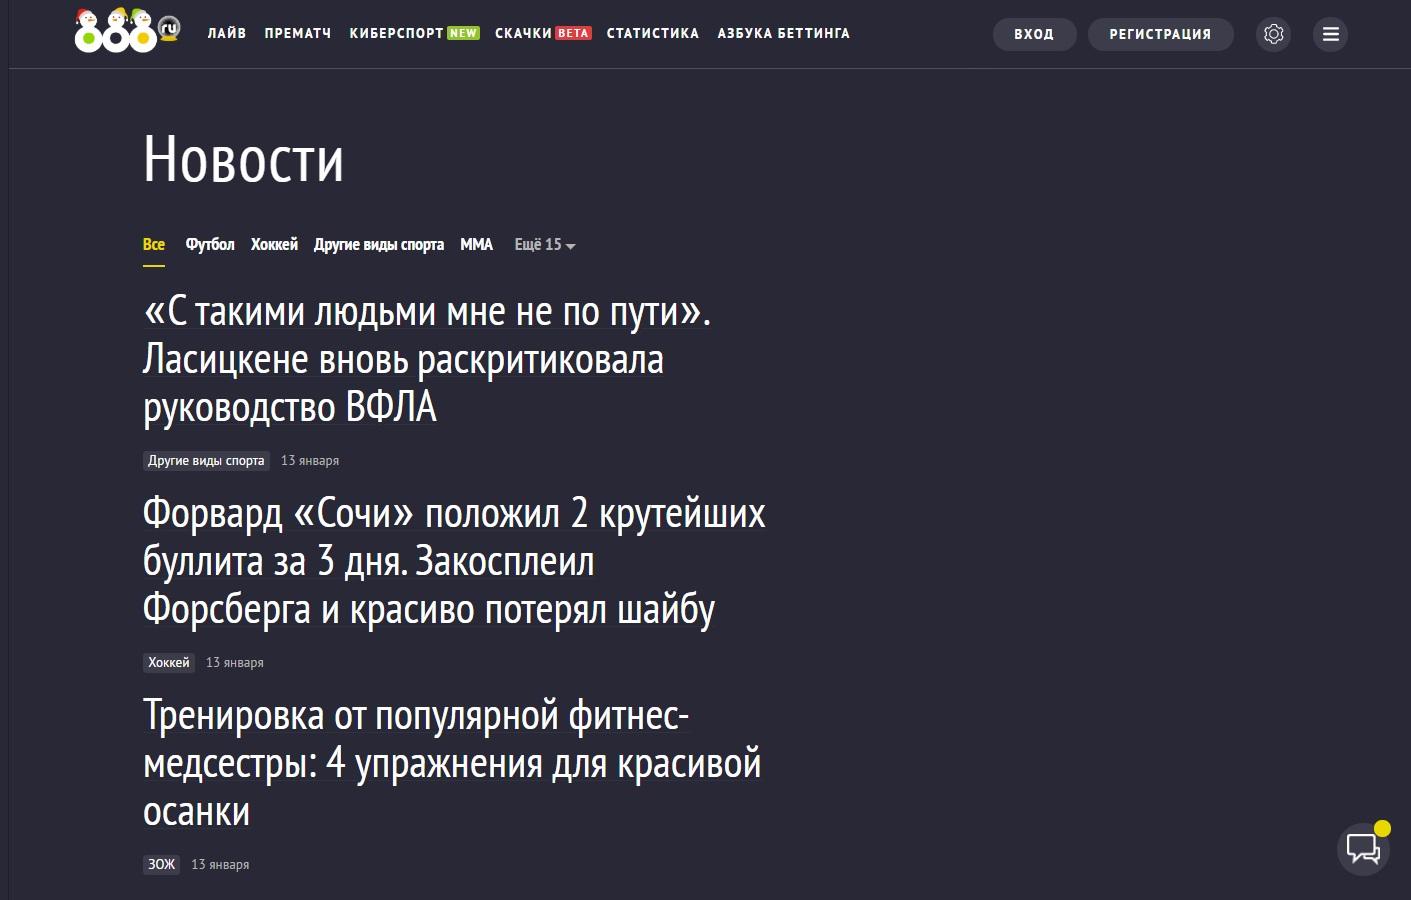 Новости 888 ru